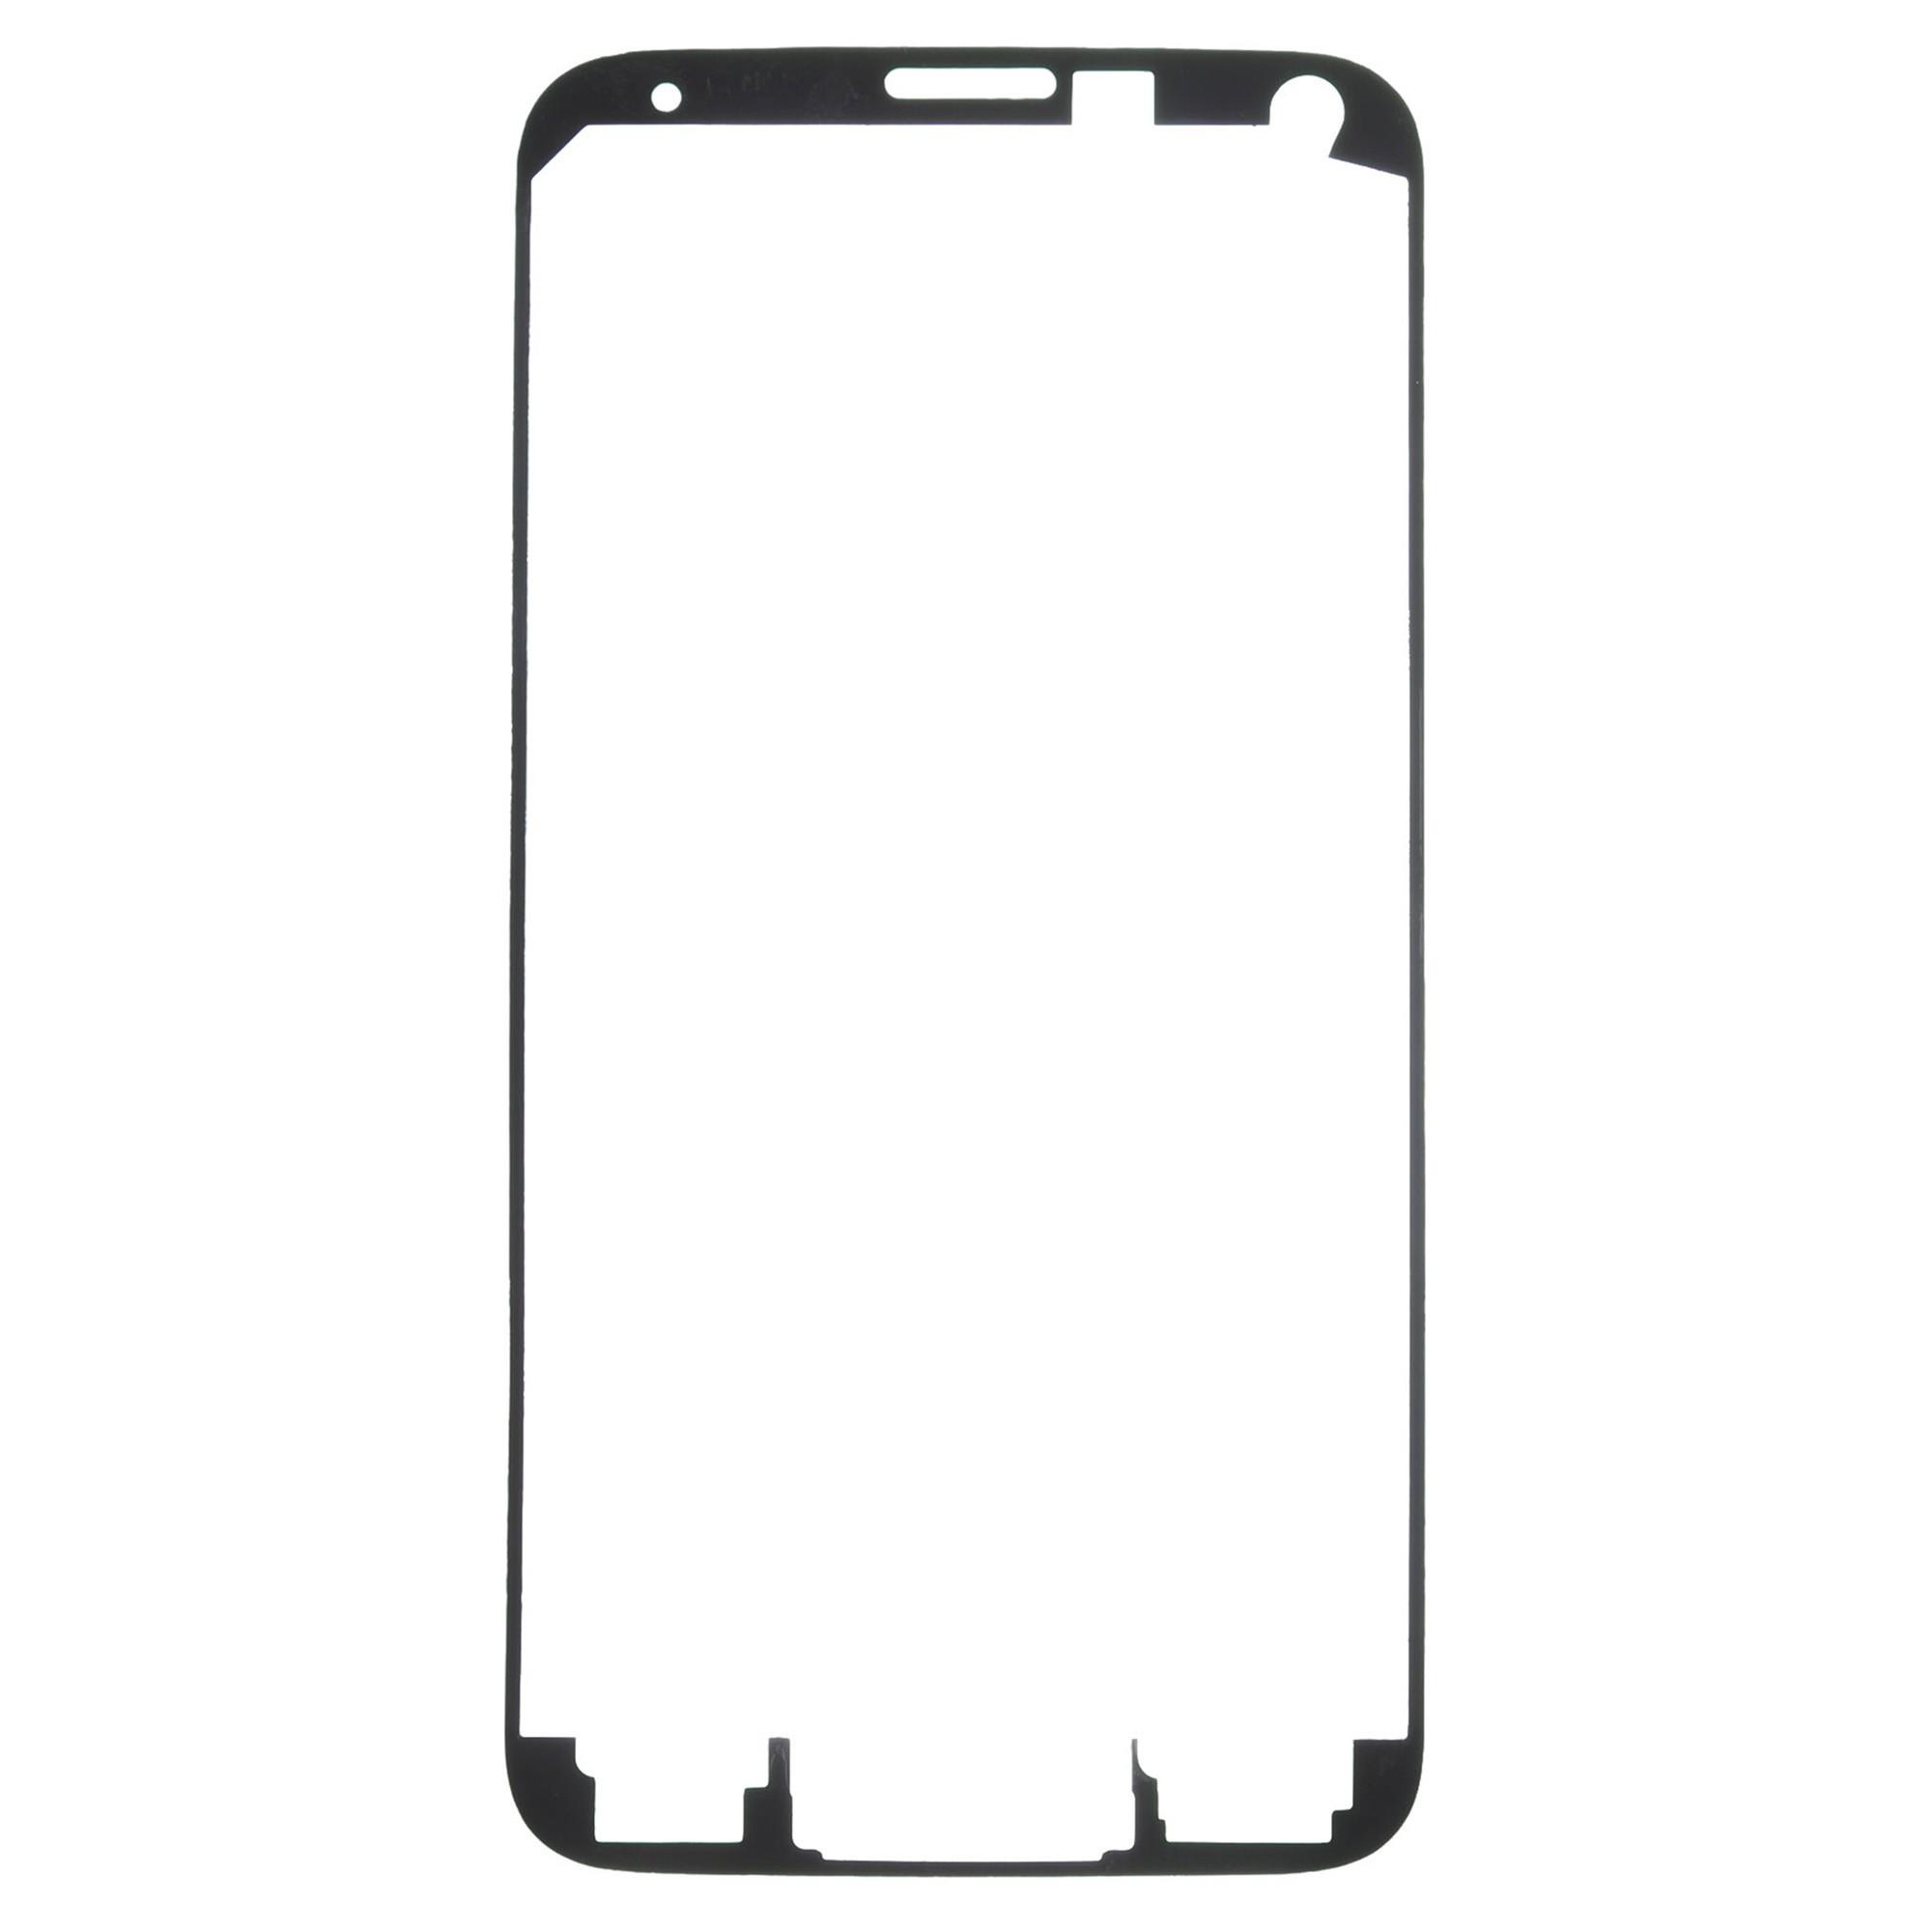 Samsung Galaxy S5 Sm G900 Front Housing Adhesive